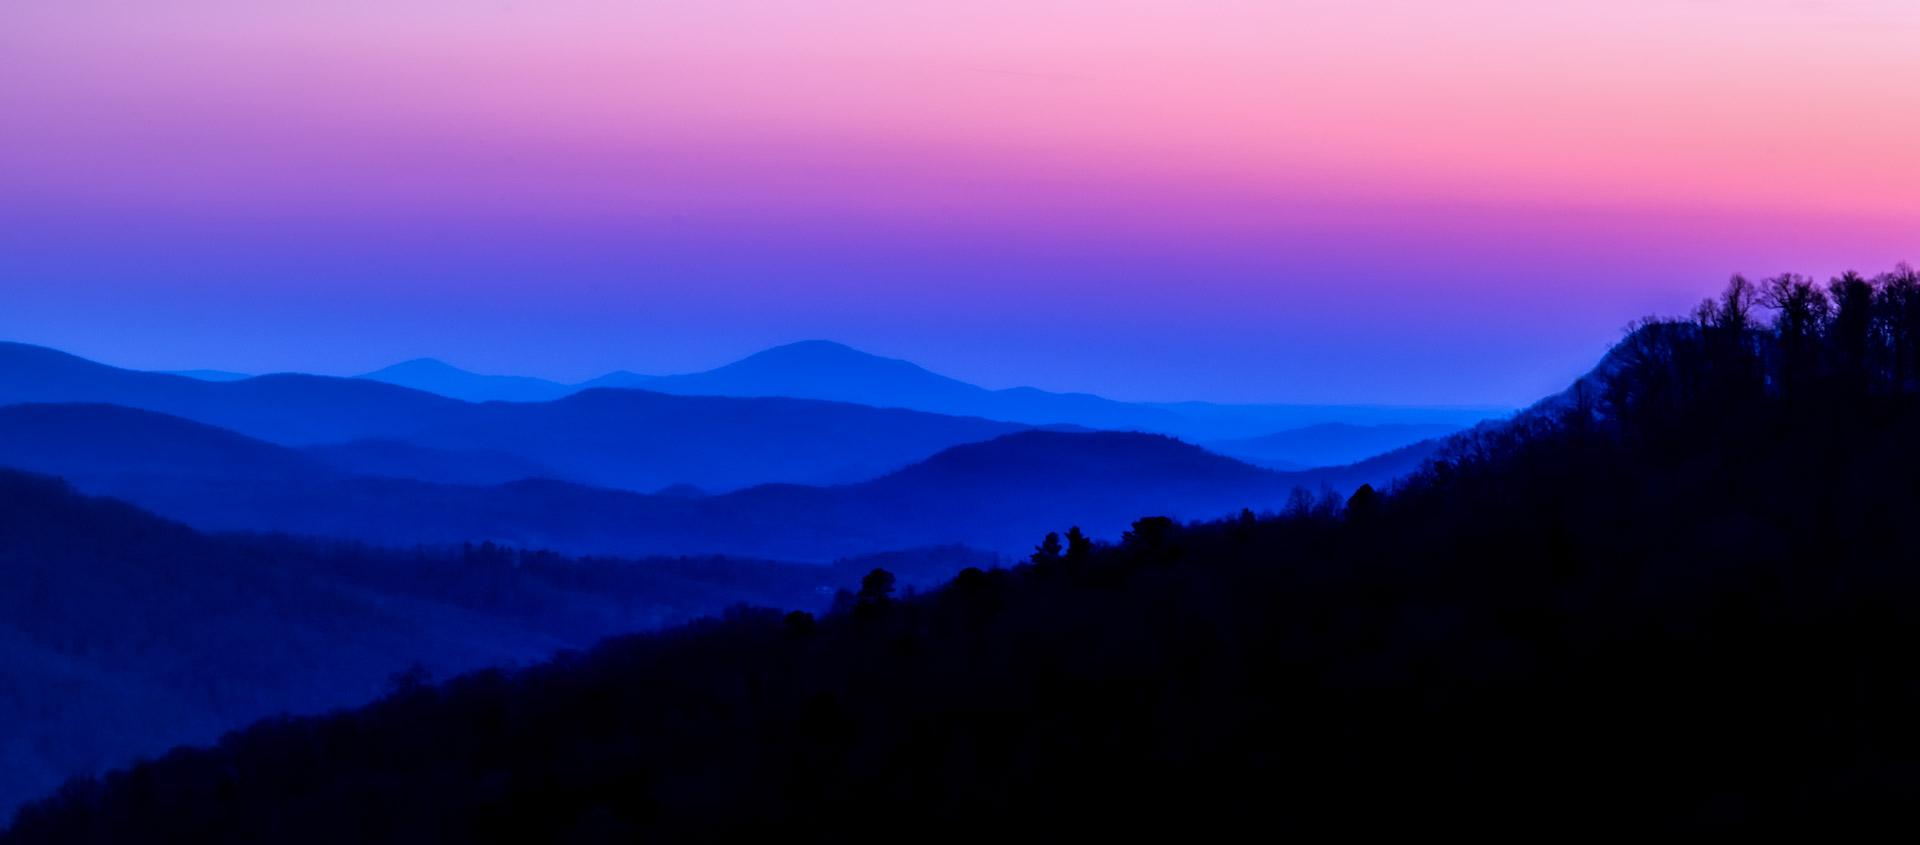 Blue_ridge-Mountains_2.jpg